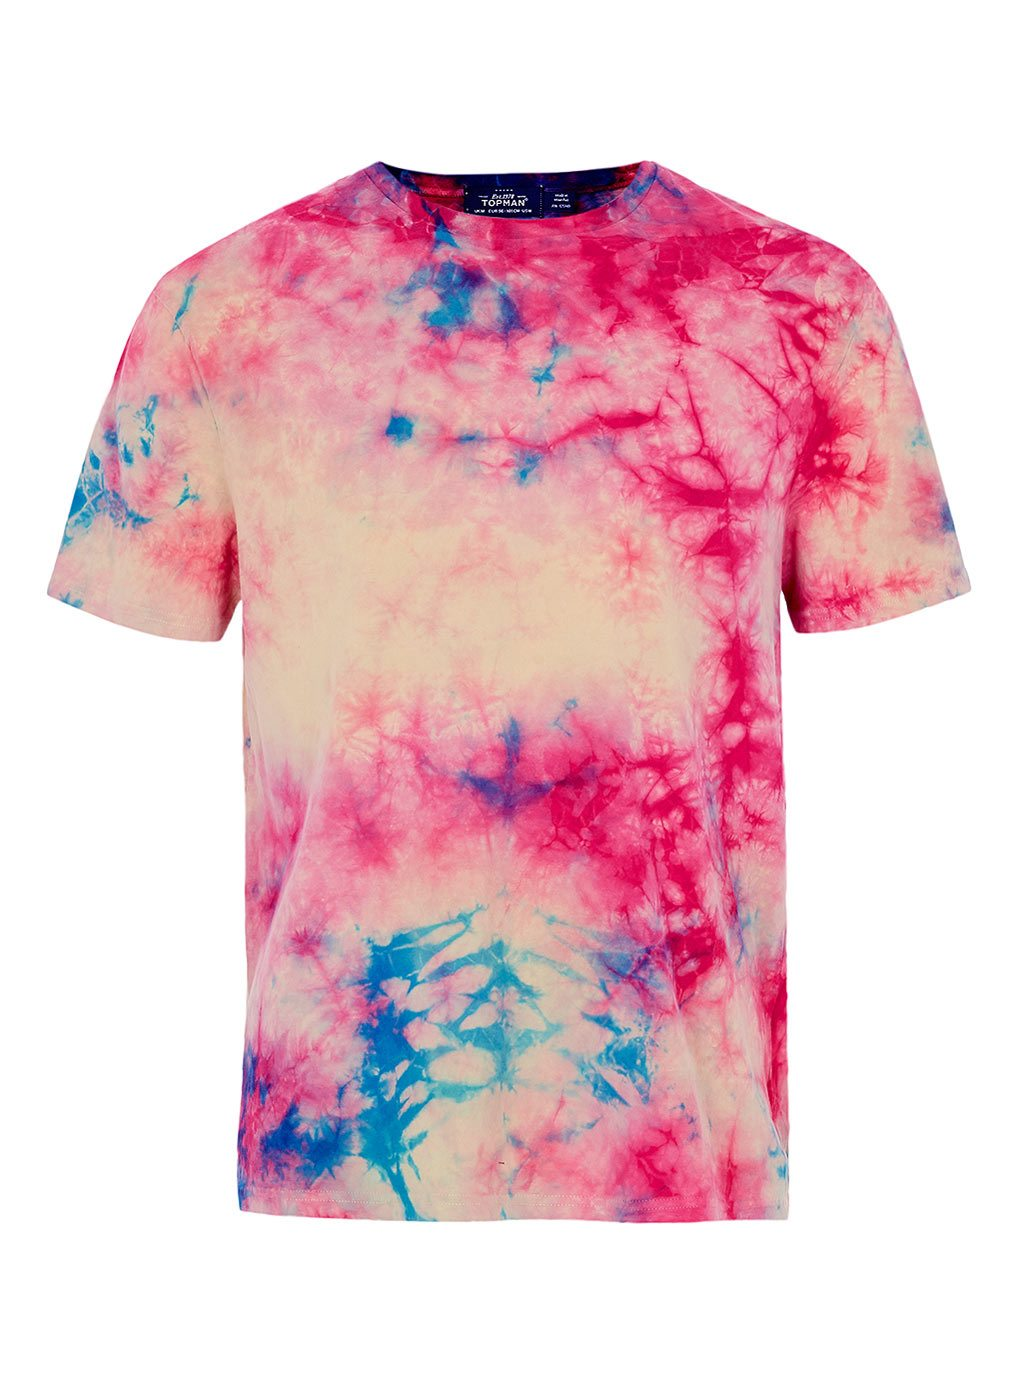 Topman-Tie-Dye-T-shirt-Pink-Blue